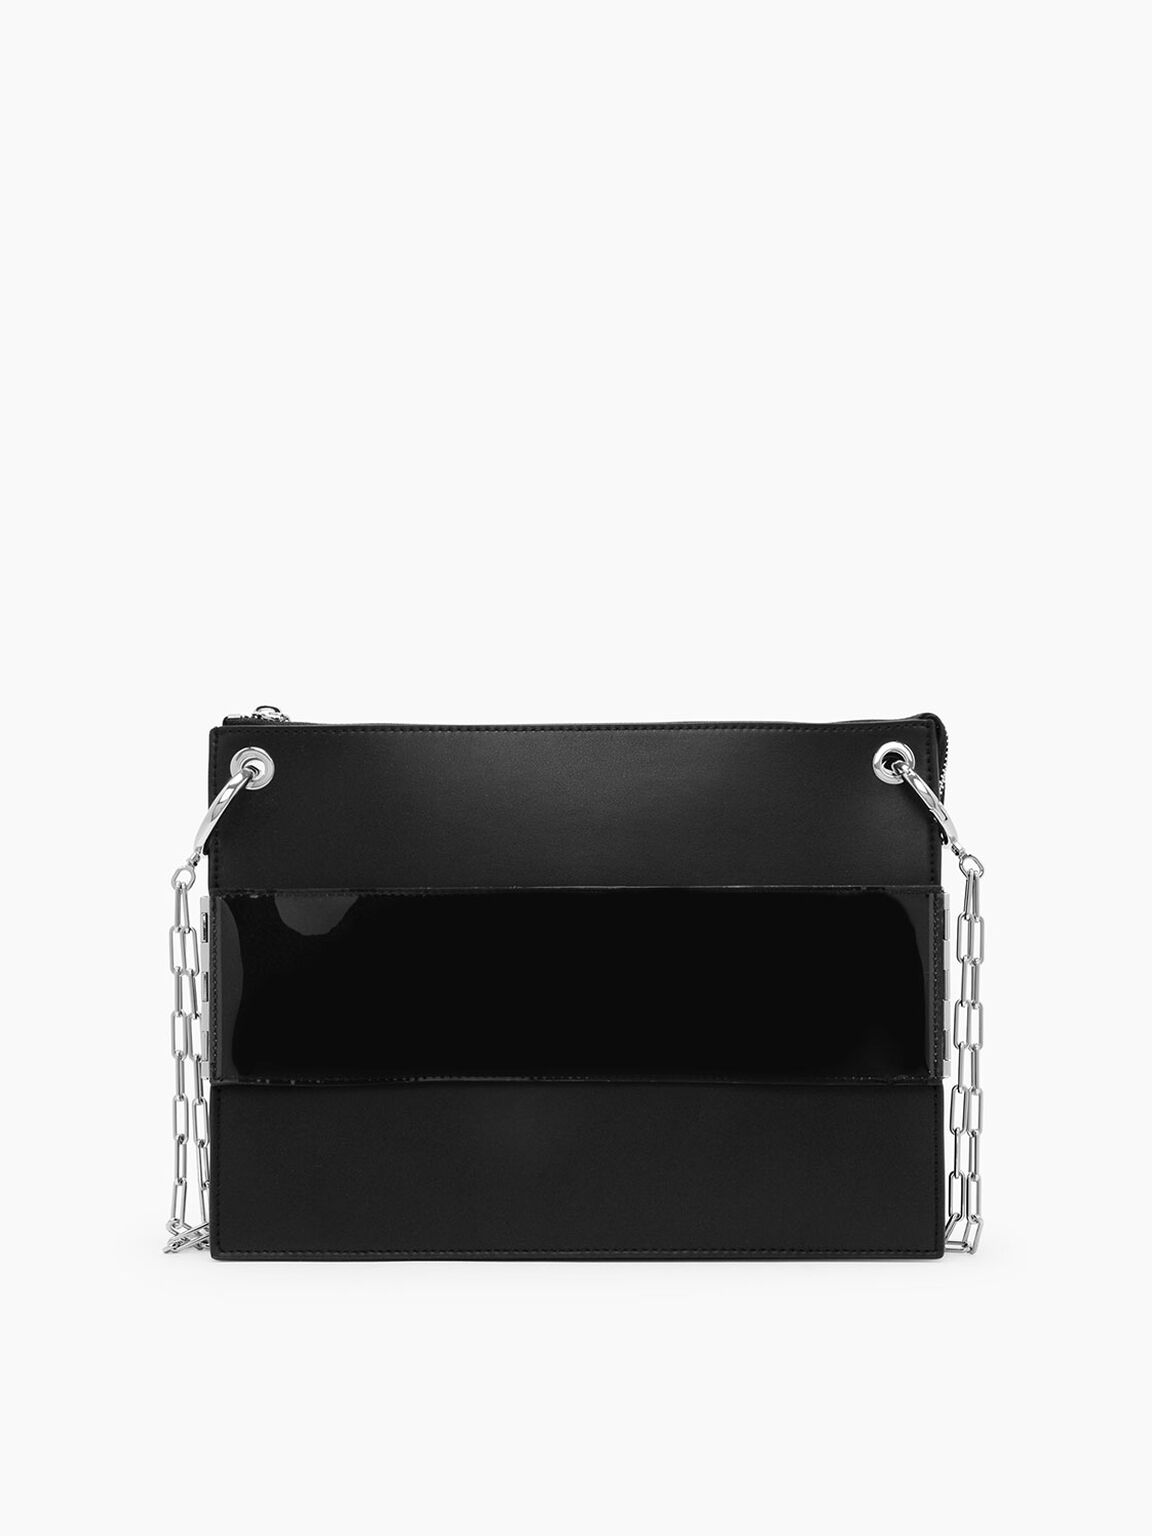 Grommet Flat Clutch, Black, hi-res